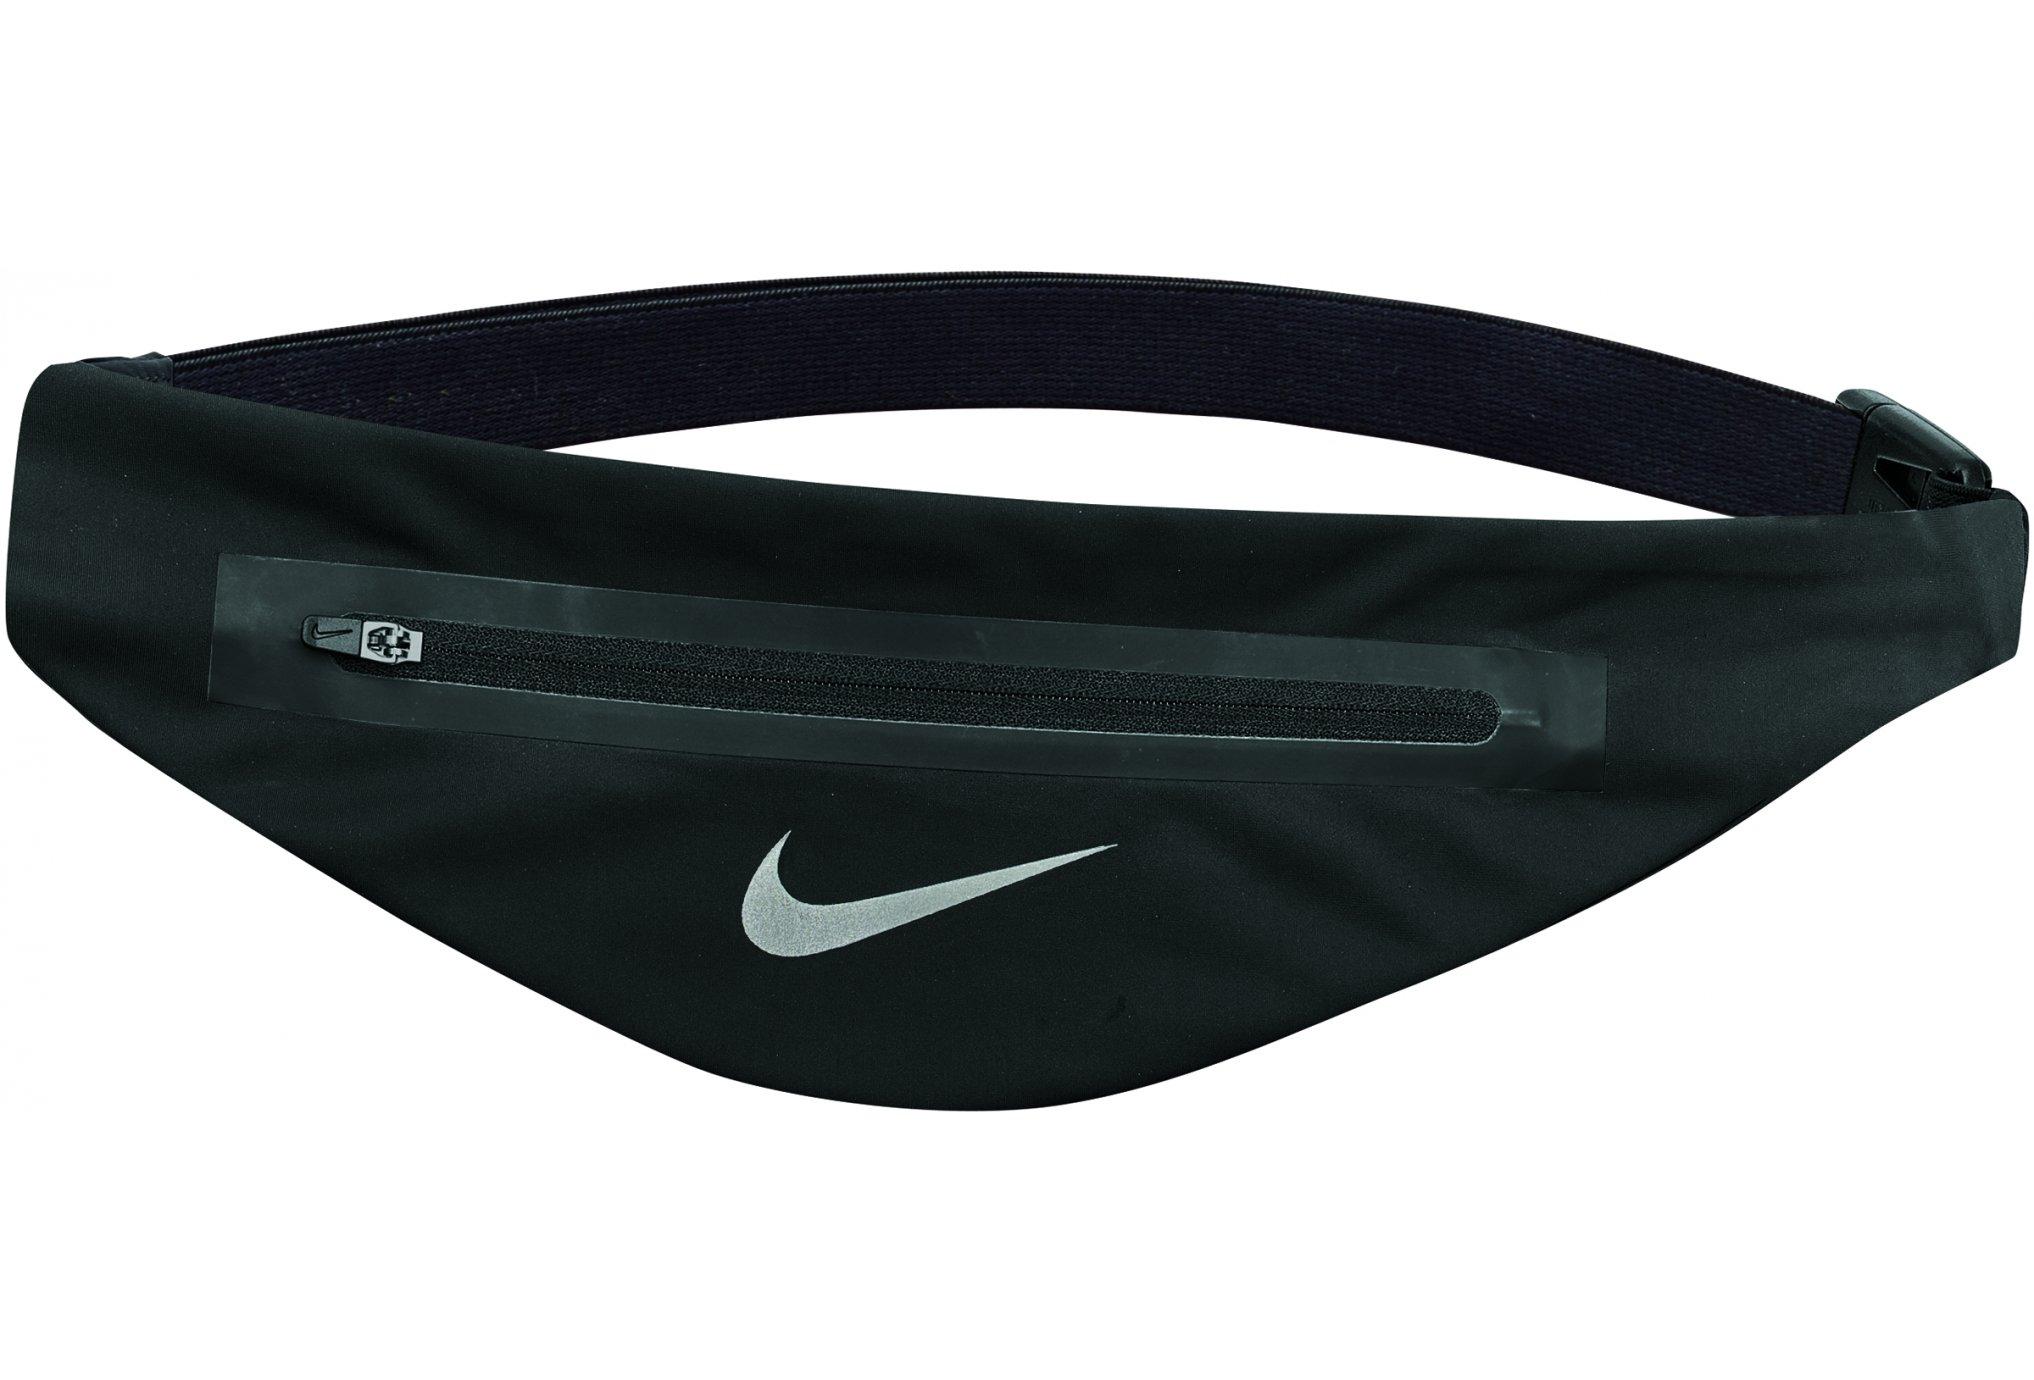 Nike Angled Waistpack Diététique Accessoires